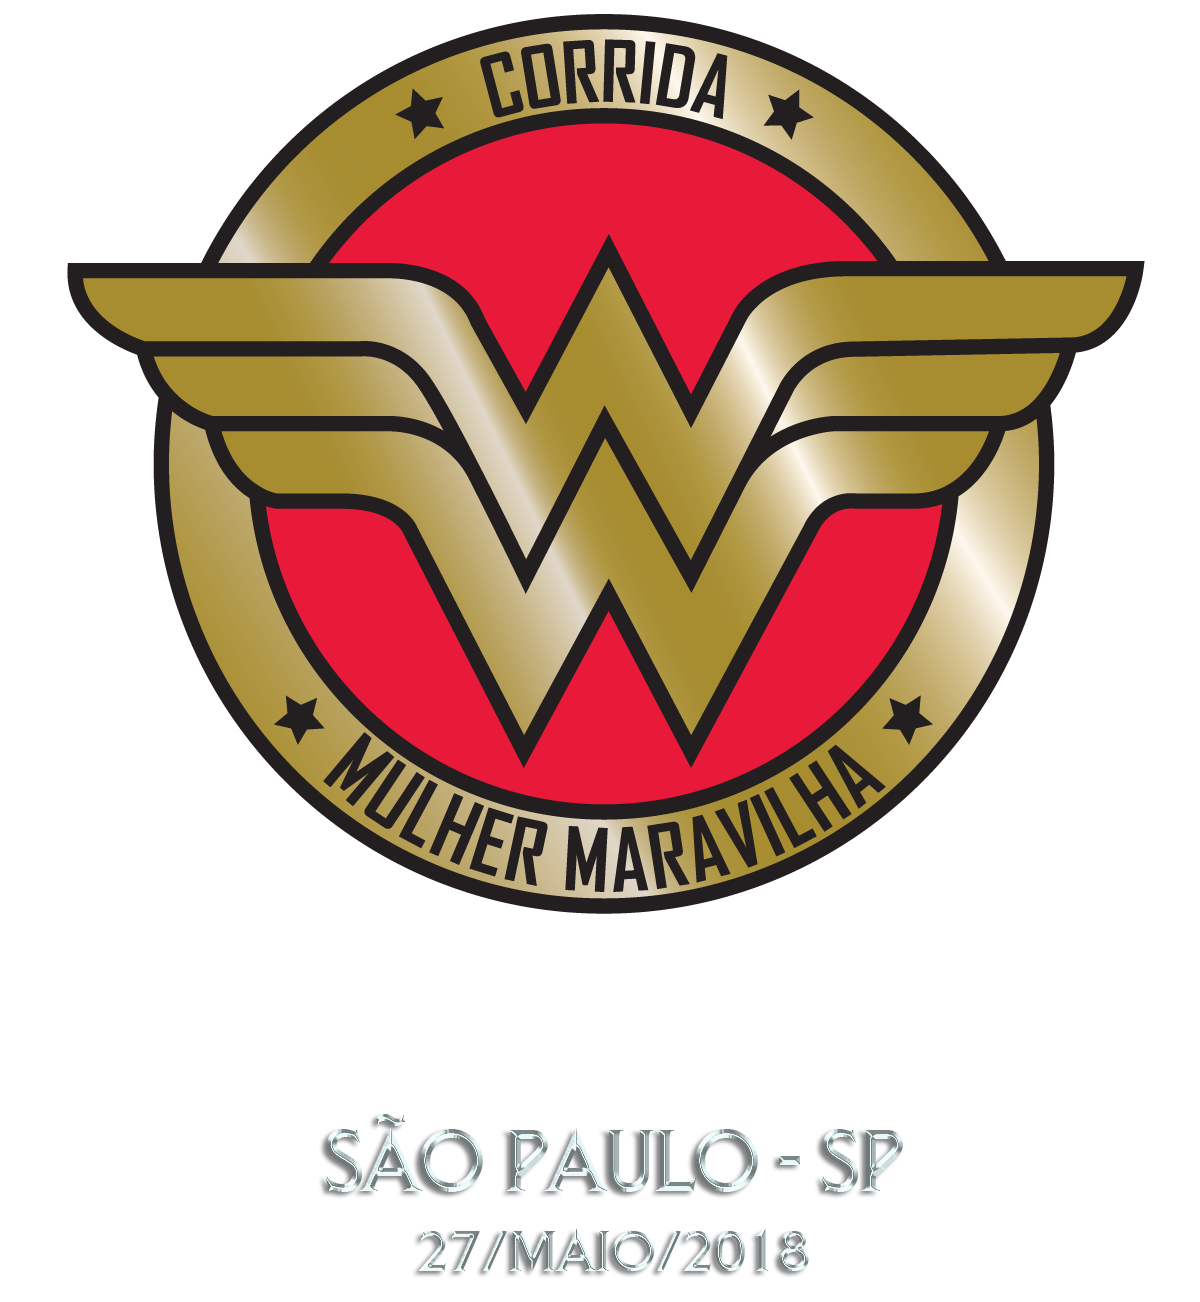 26c669653 Corrida Mulher-Maravilha São Paulo